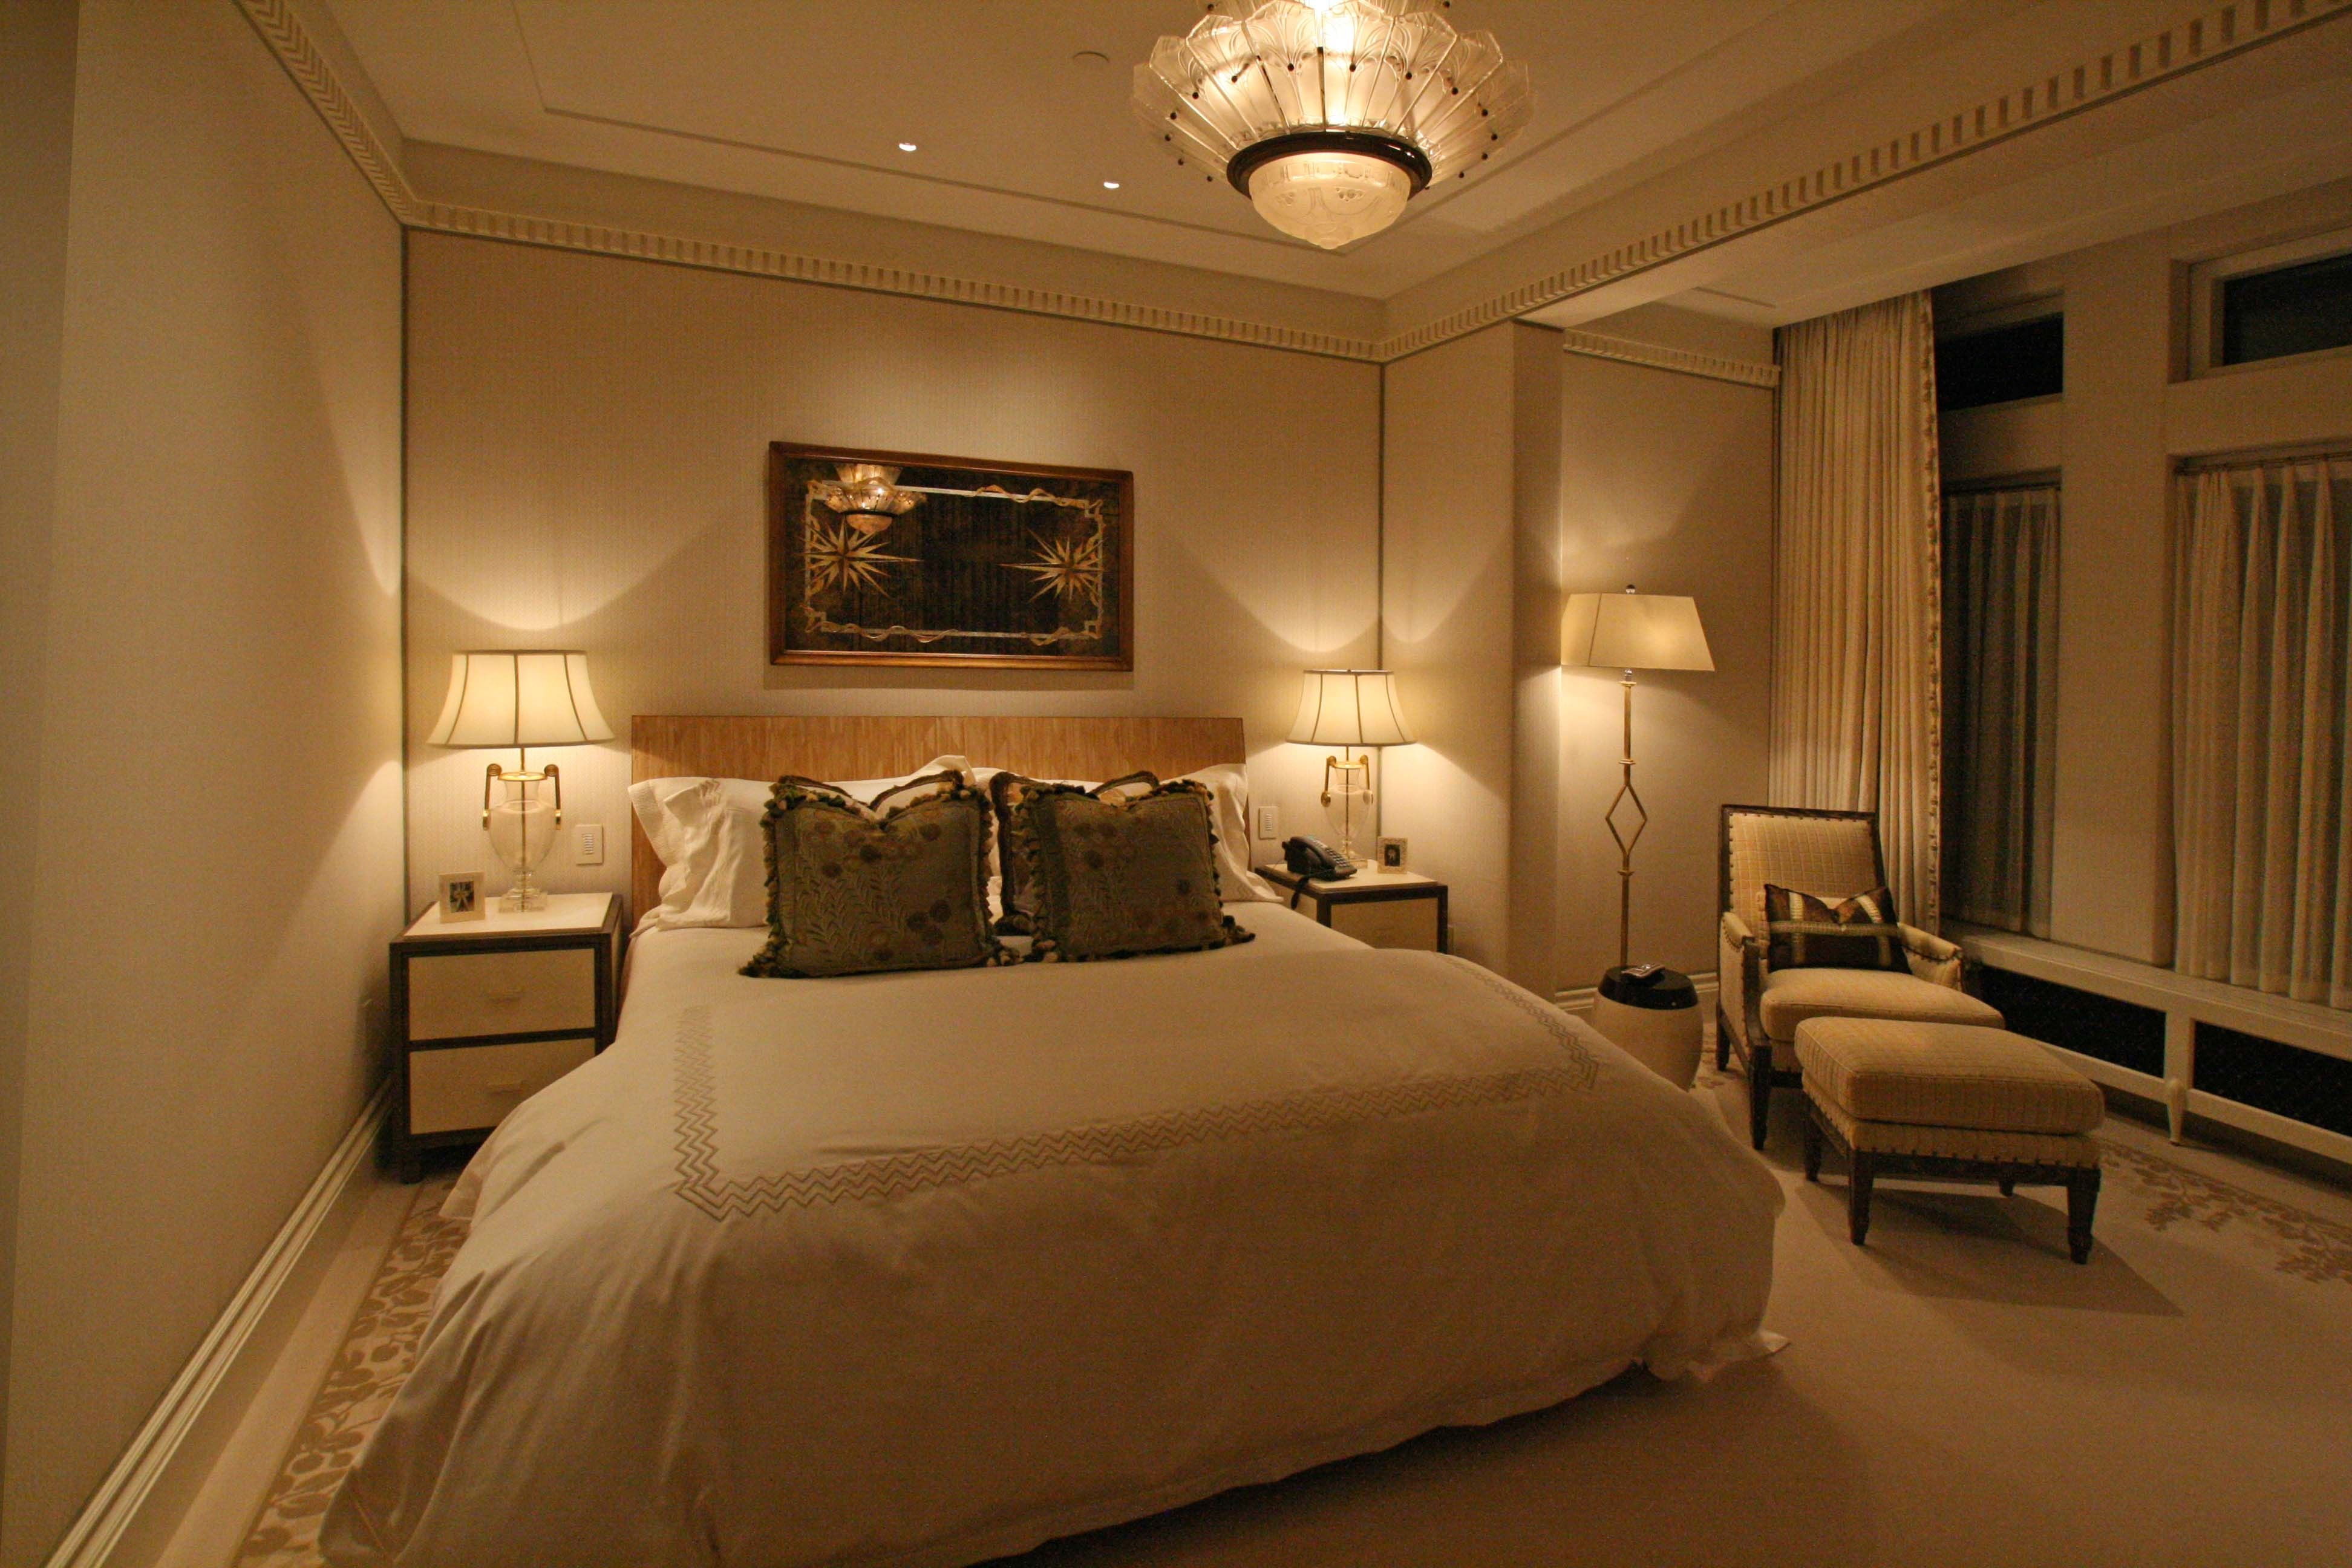 Bedroom lights ideas  Best Pendant Lights For Bedroom  Bedroom Design  Pinterest